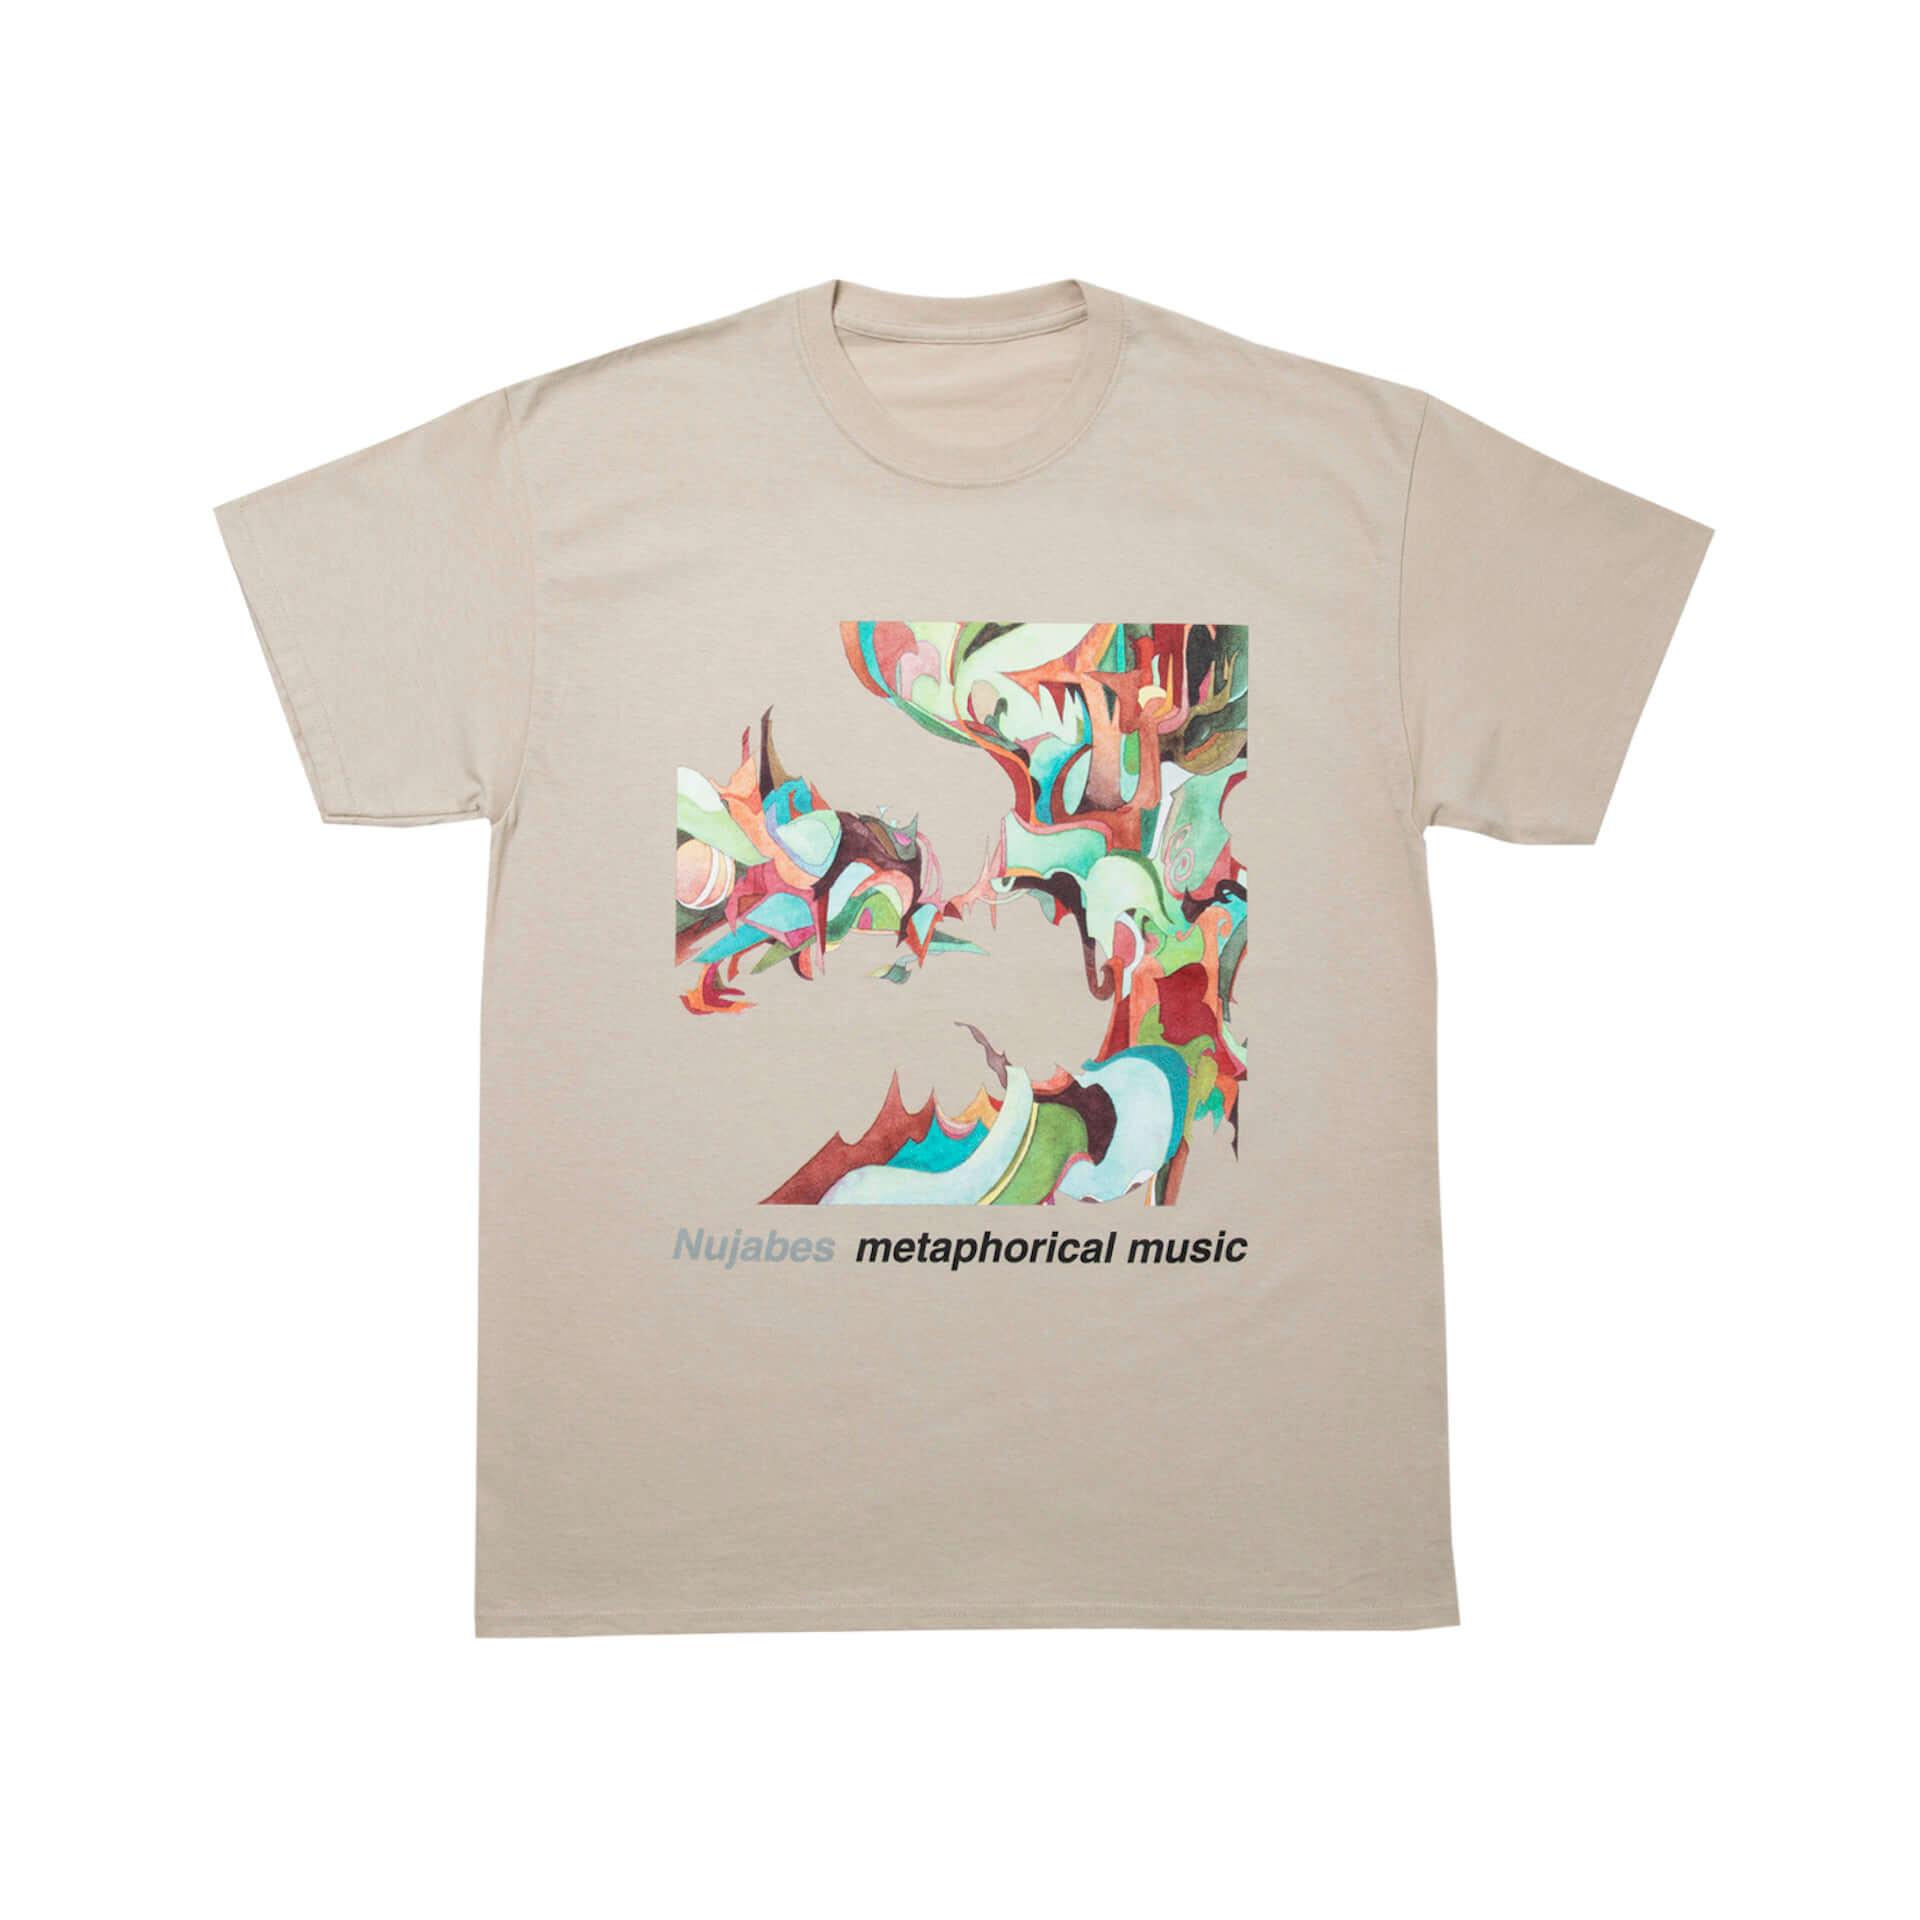 Nujabesの名盤『metaphorical music』ジャケットが施されたTシャツやフーディーなど続々登場!ポップアップ最新グッズの予約受付が開始 lf210205_nujabes_3-1920x1920